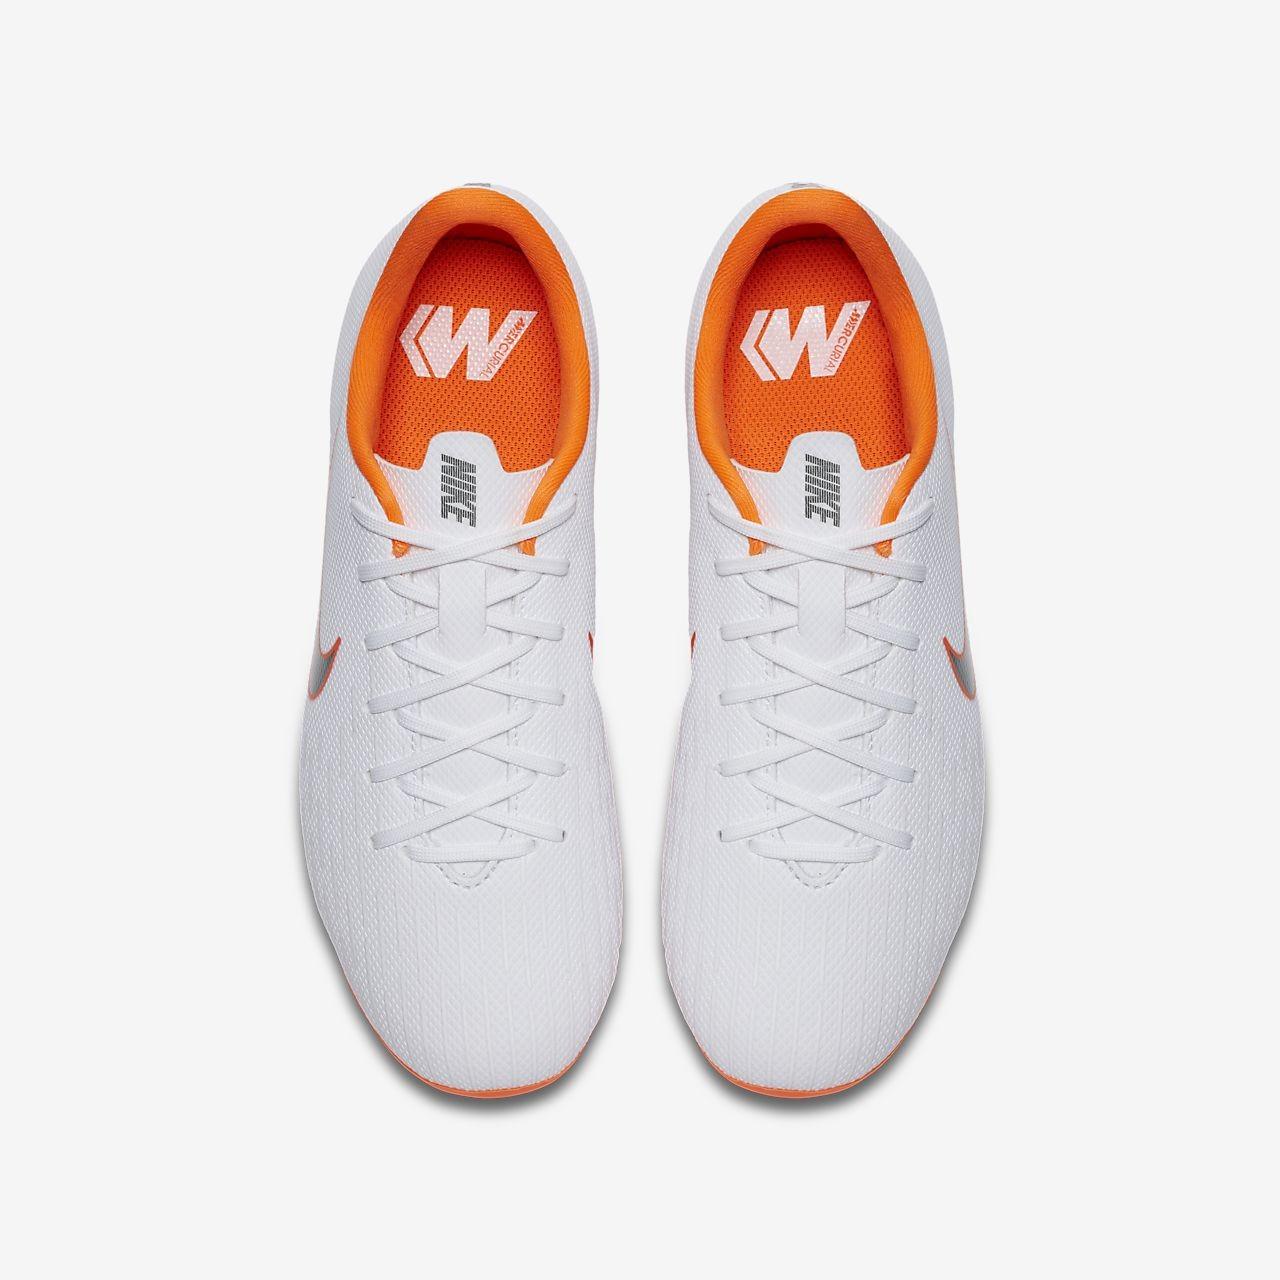 Botas de fútbol junior Nike Mercurial Vapor XII por sólo 22 euros con este  cupón de descuento 6b964a450fd59